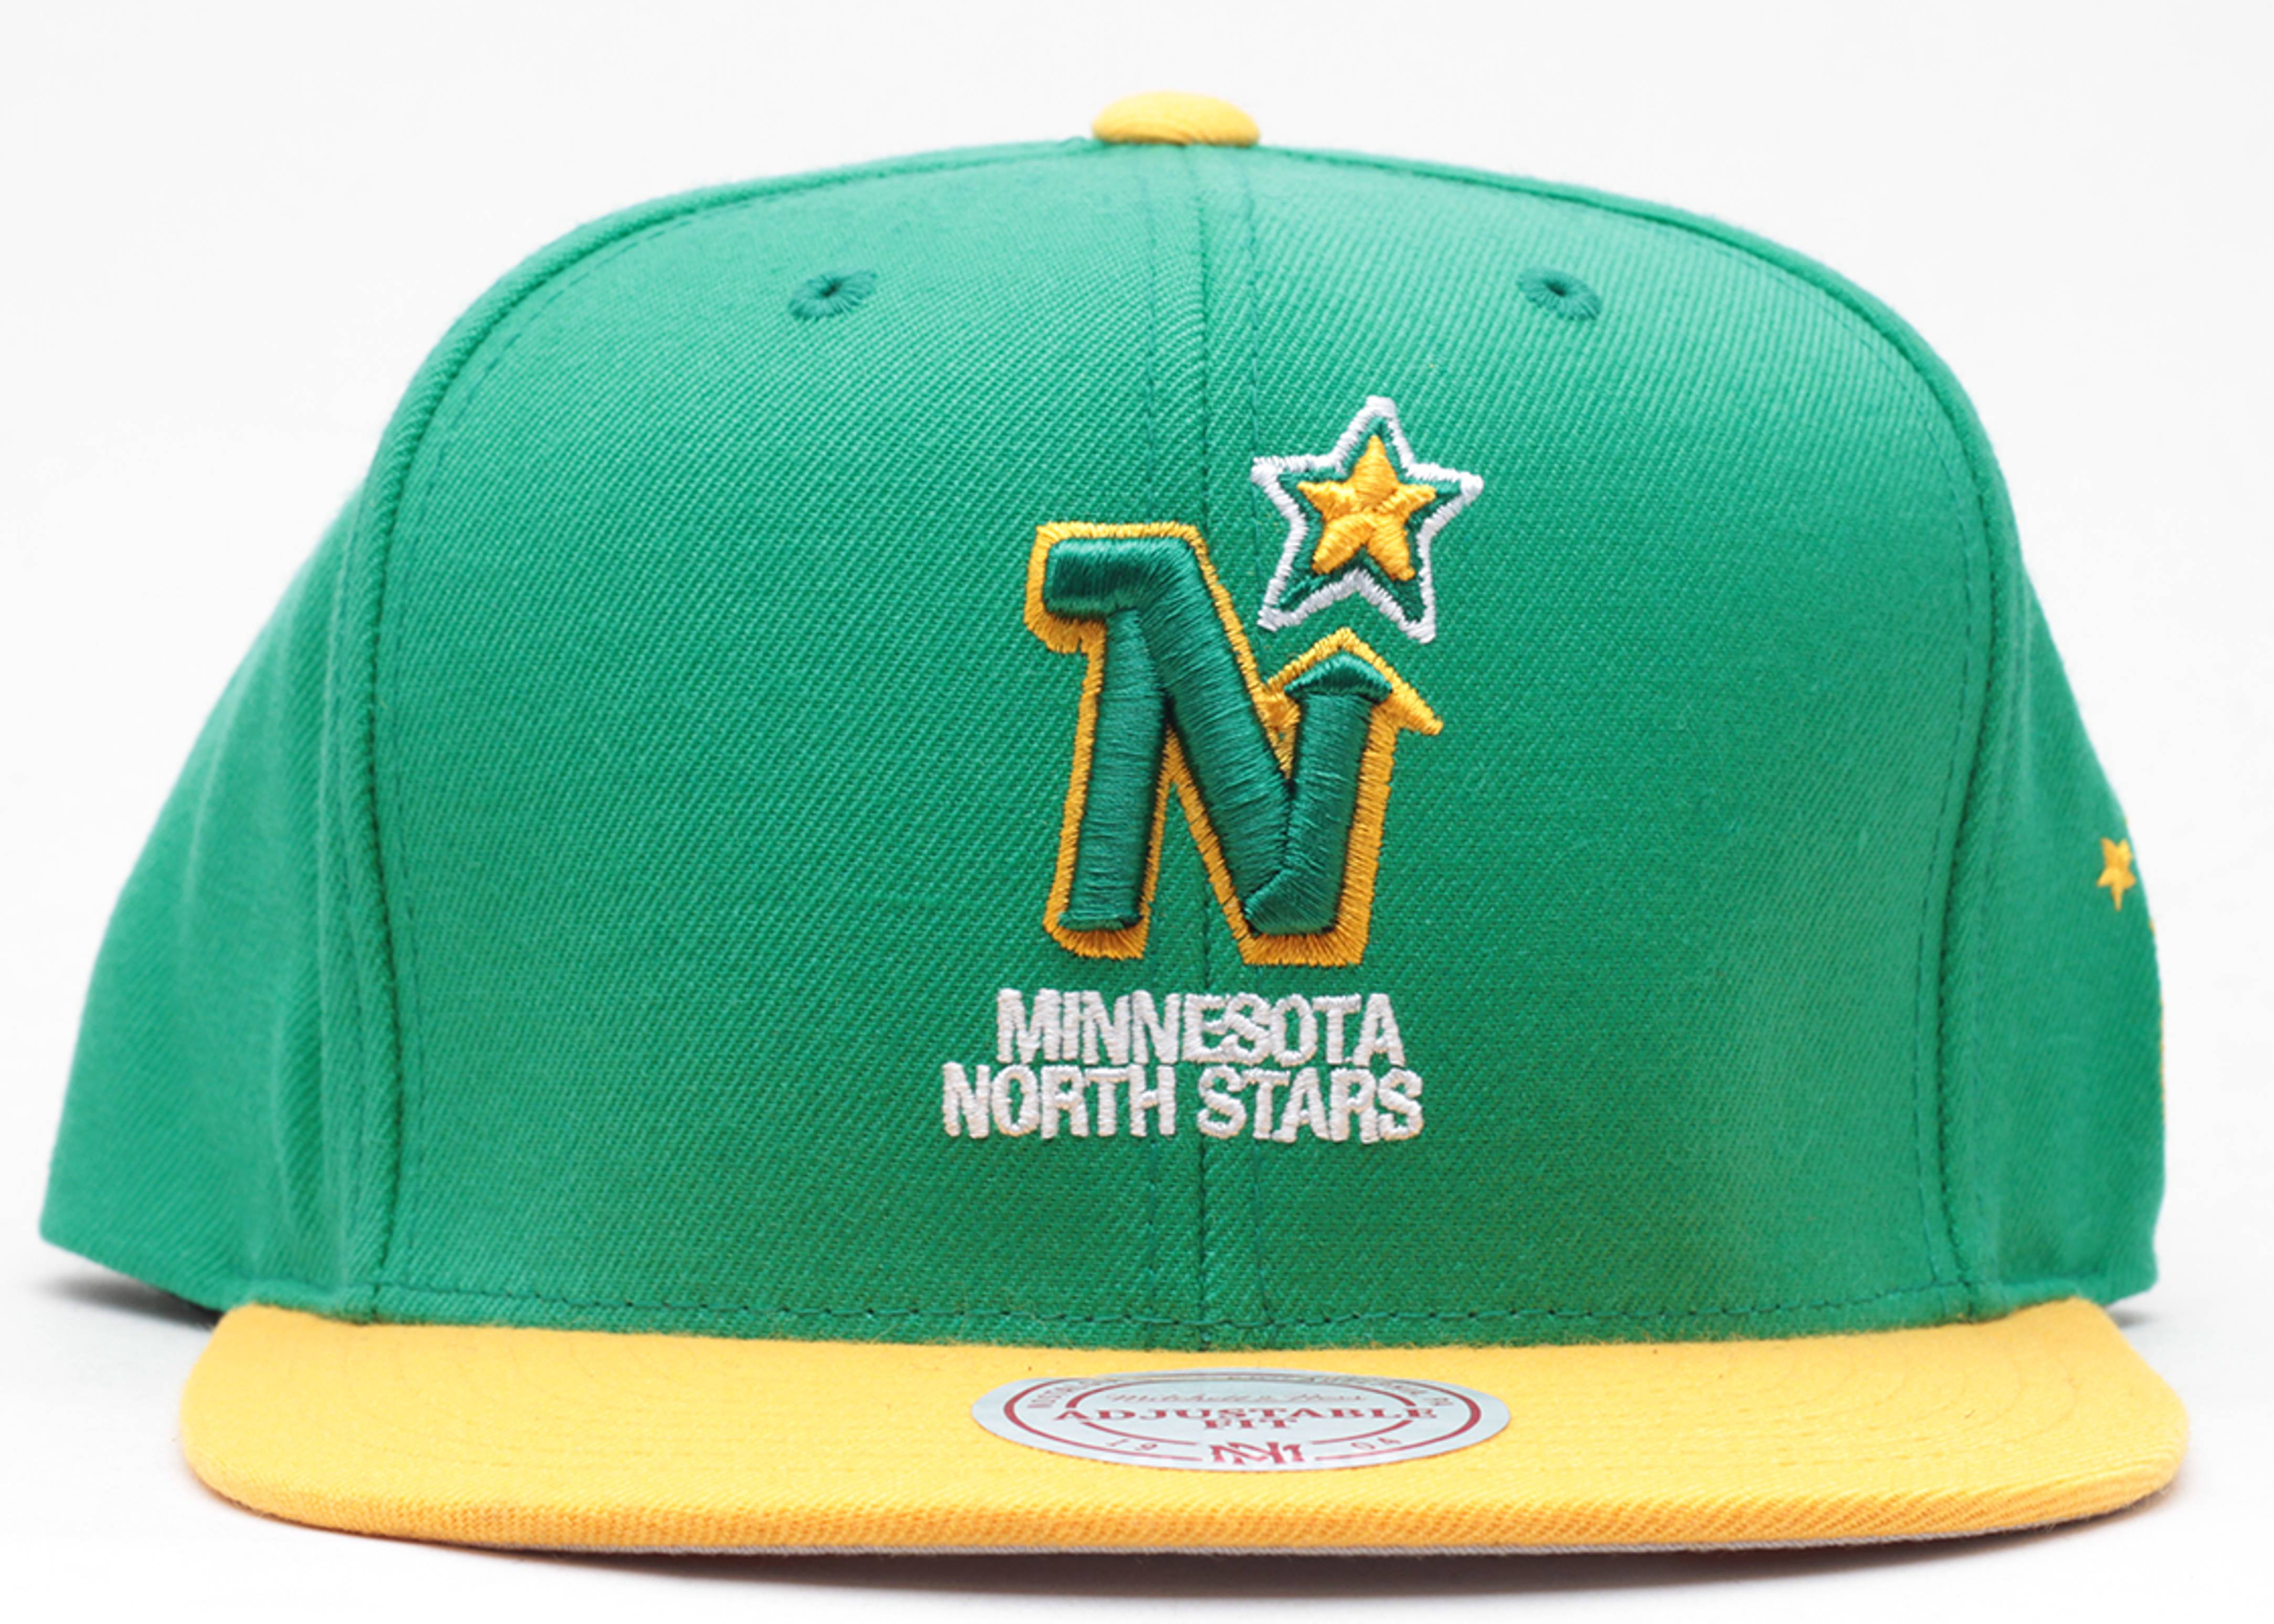 minnesota north stars snap-back